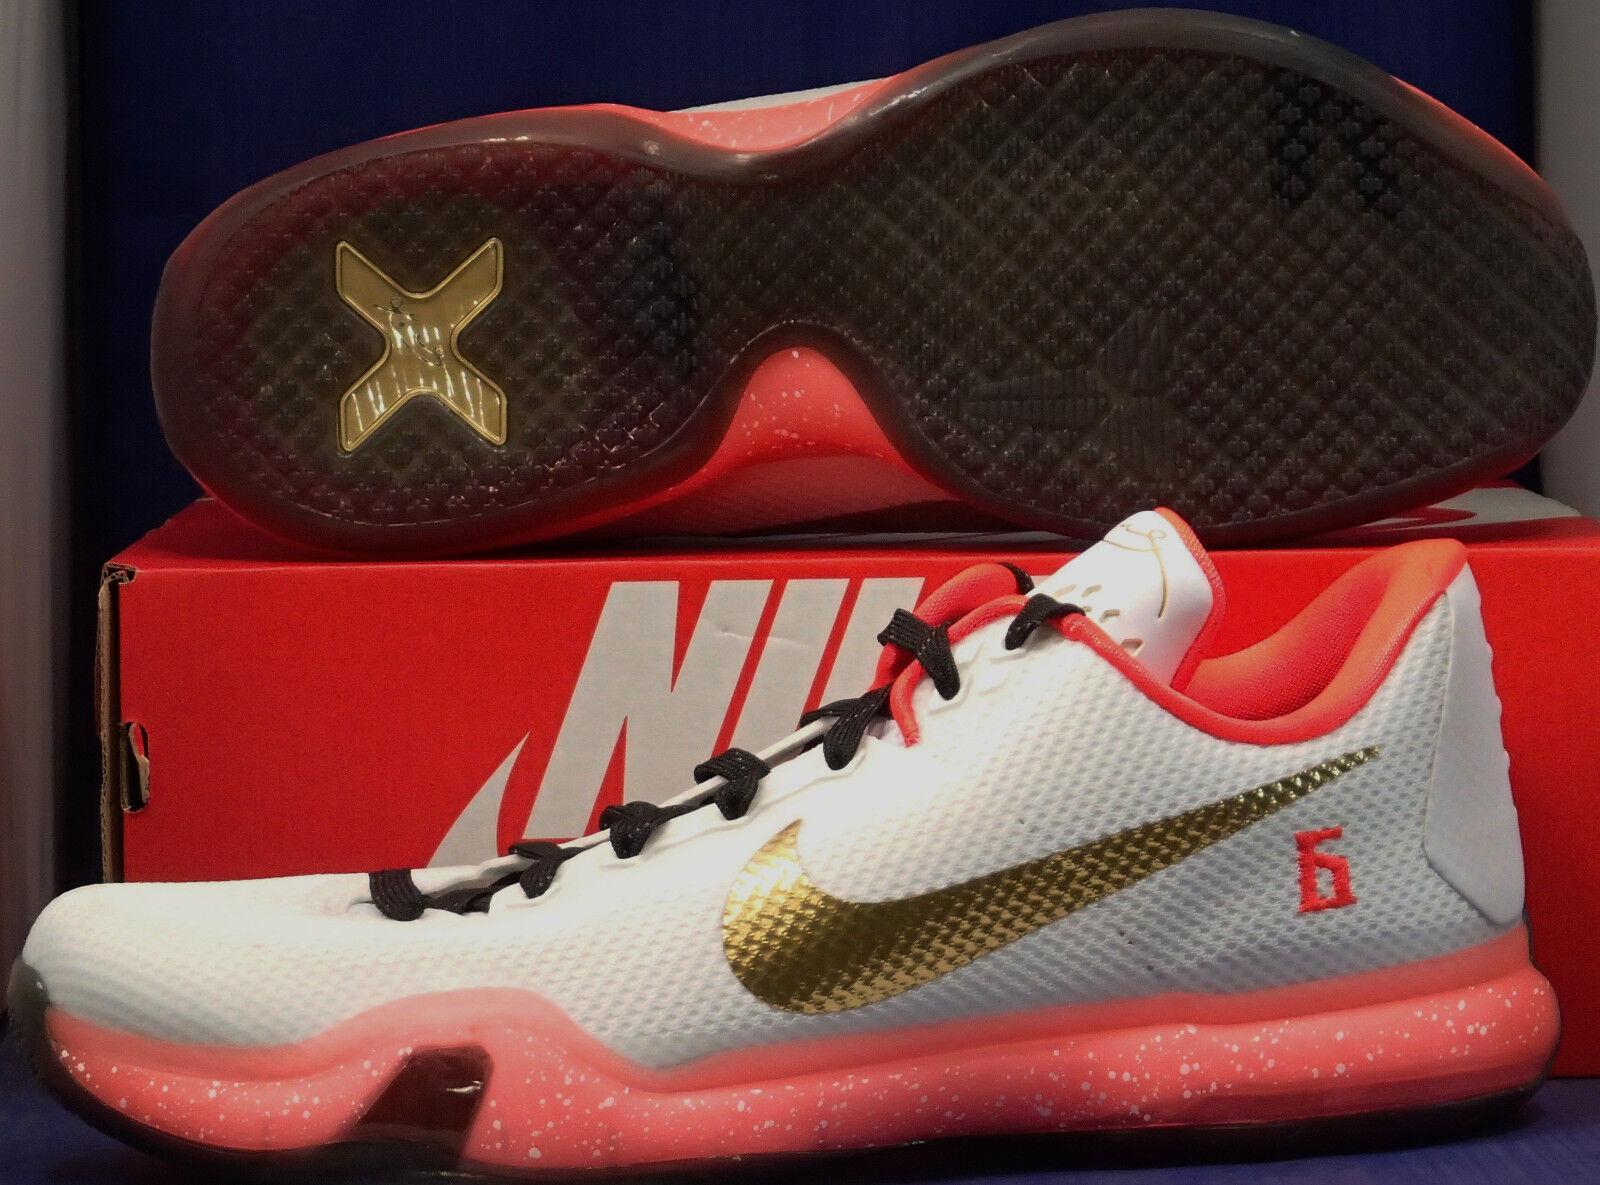 Nike Kobe X 10 iD White Bright Crimson Metallic gold Black SZ 13 ( 777411-971 )